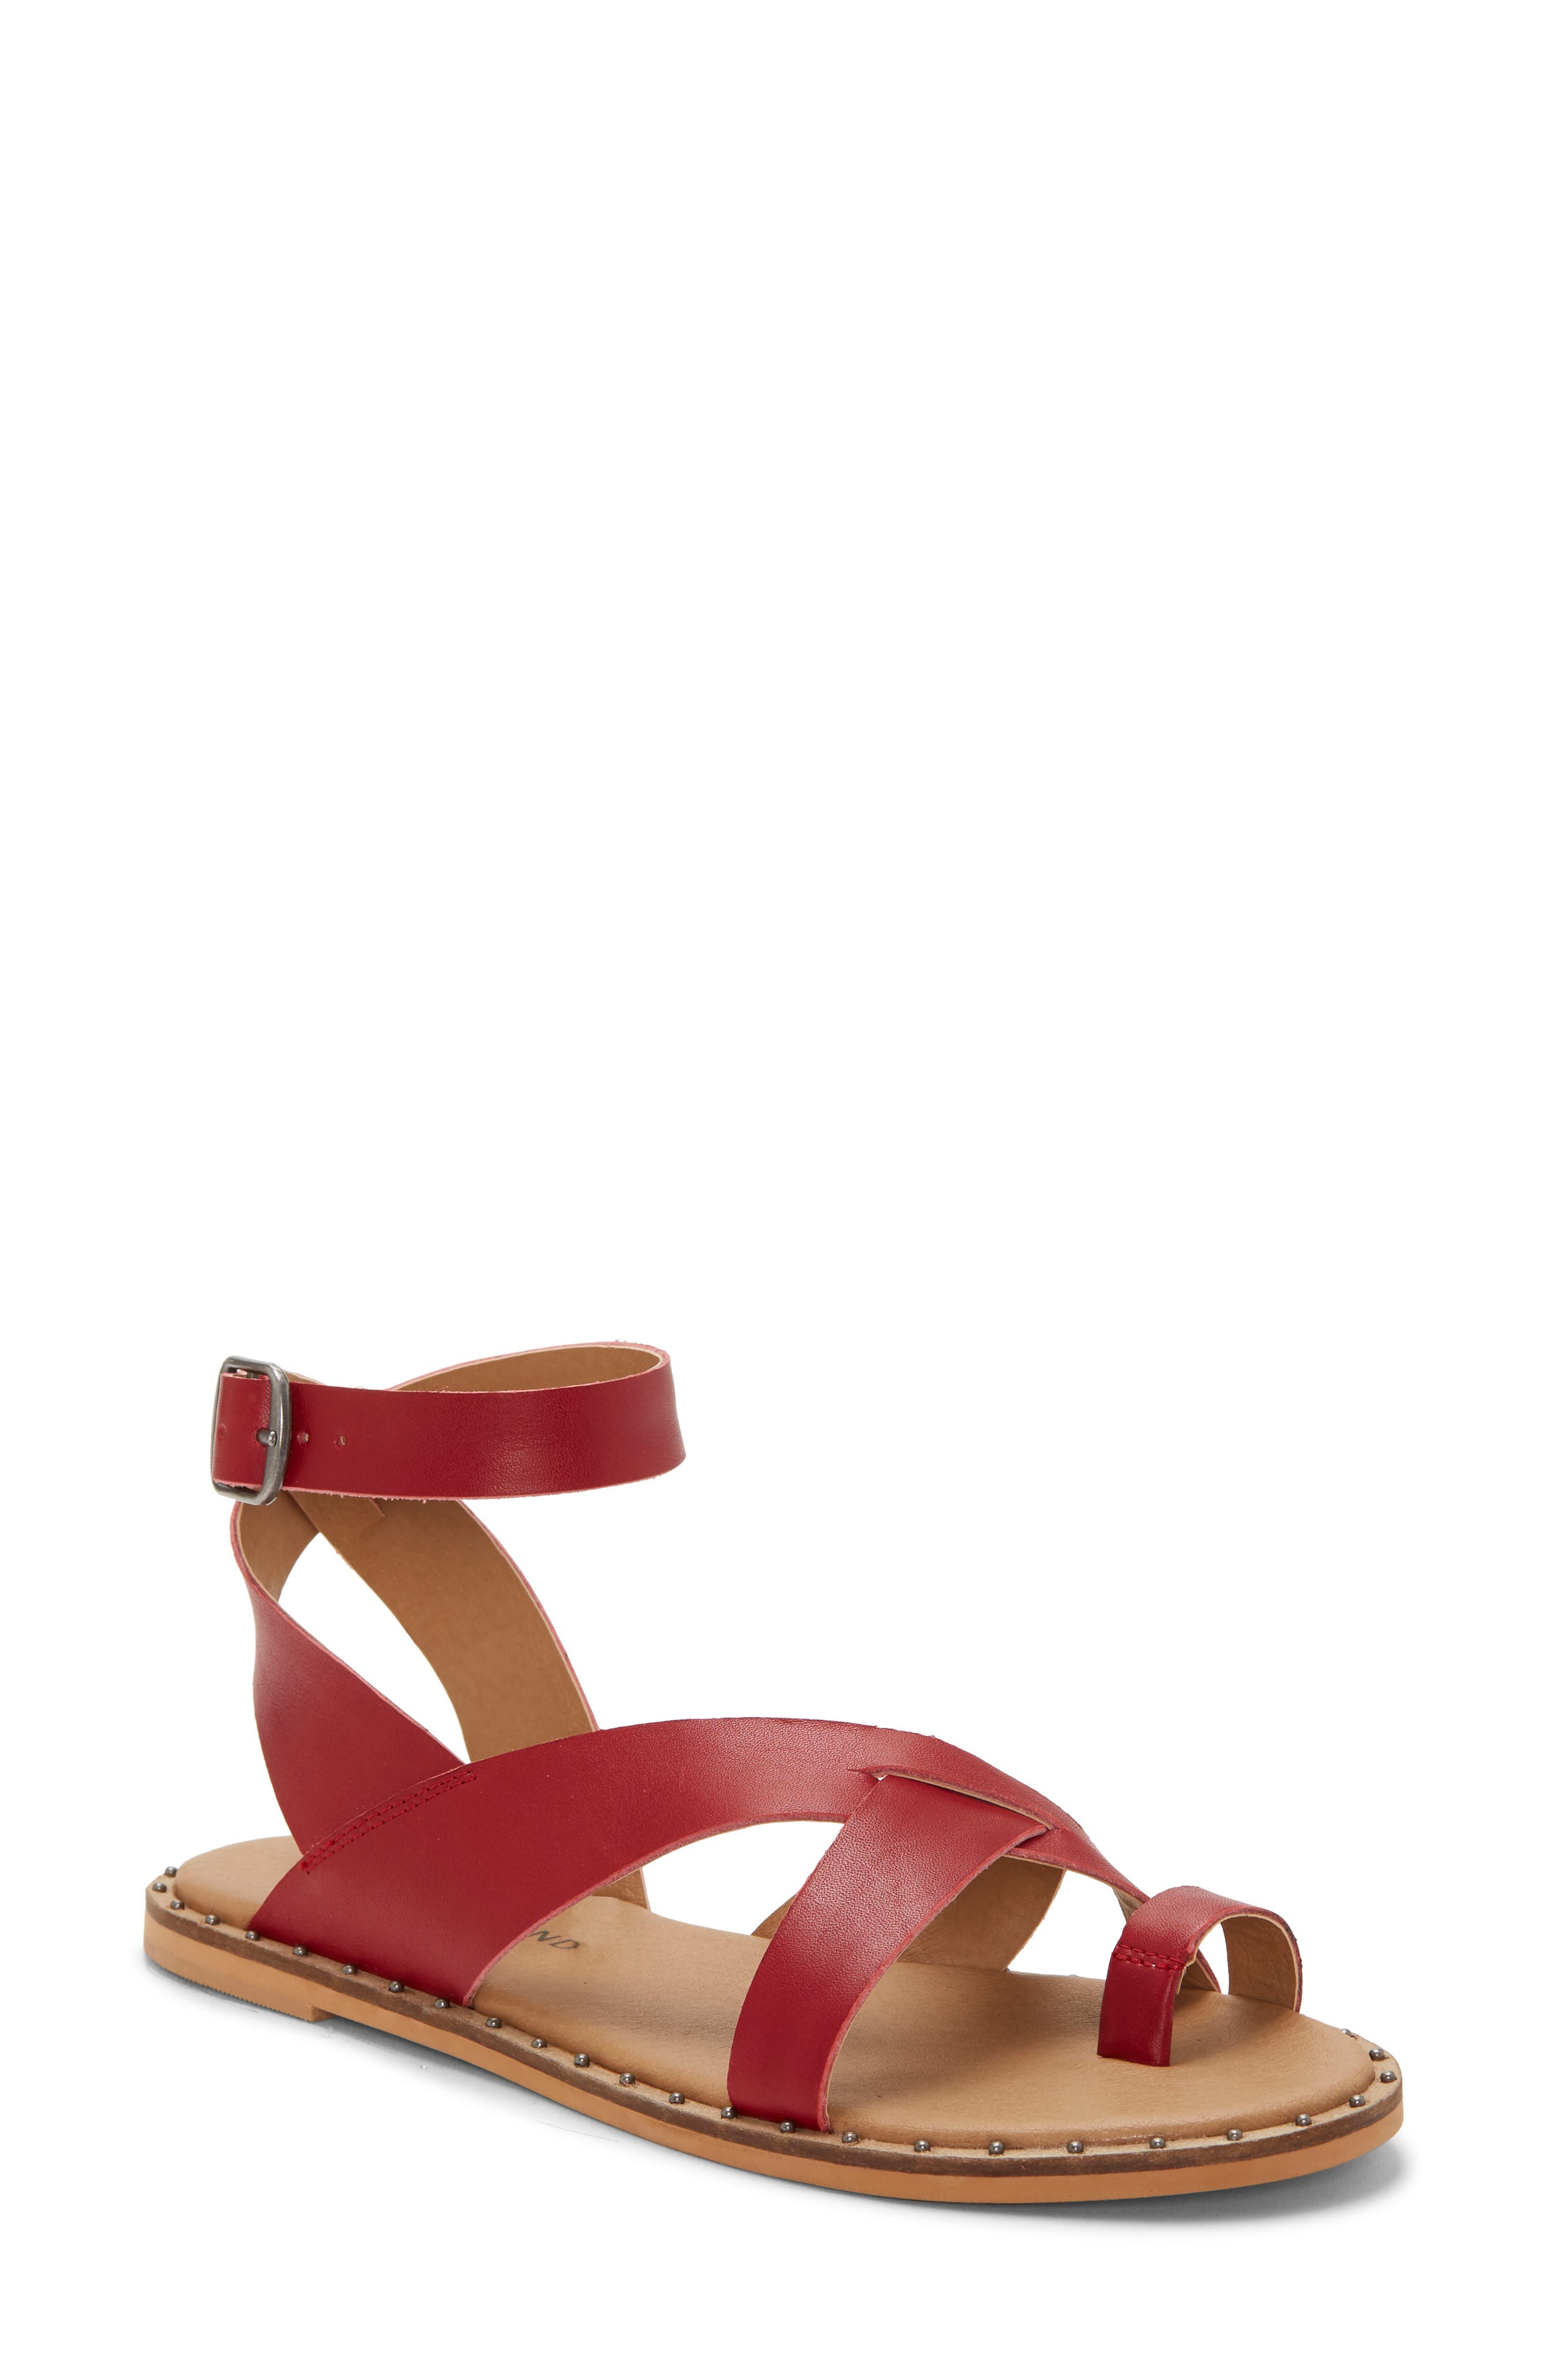 Lucky Brand Farran Toe Loop Sandal, Red